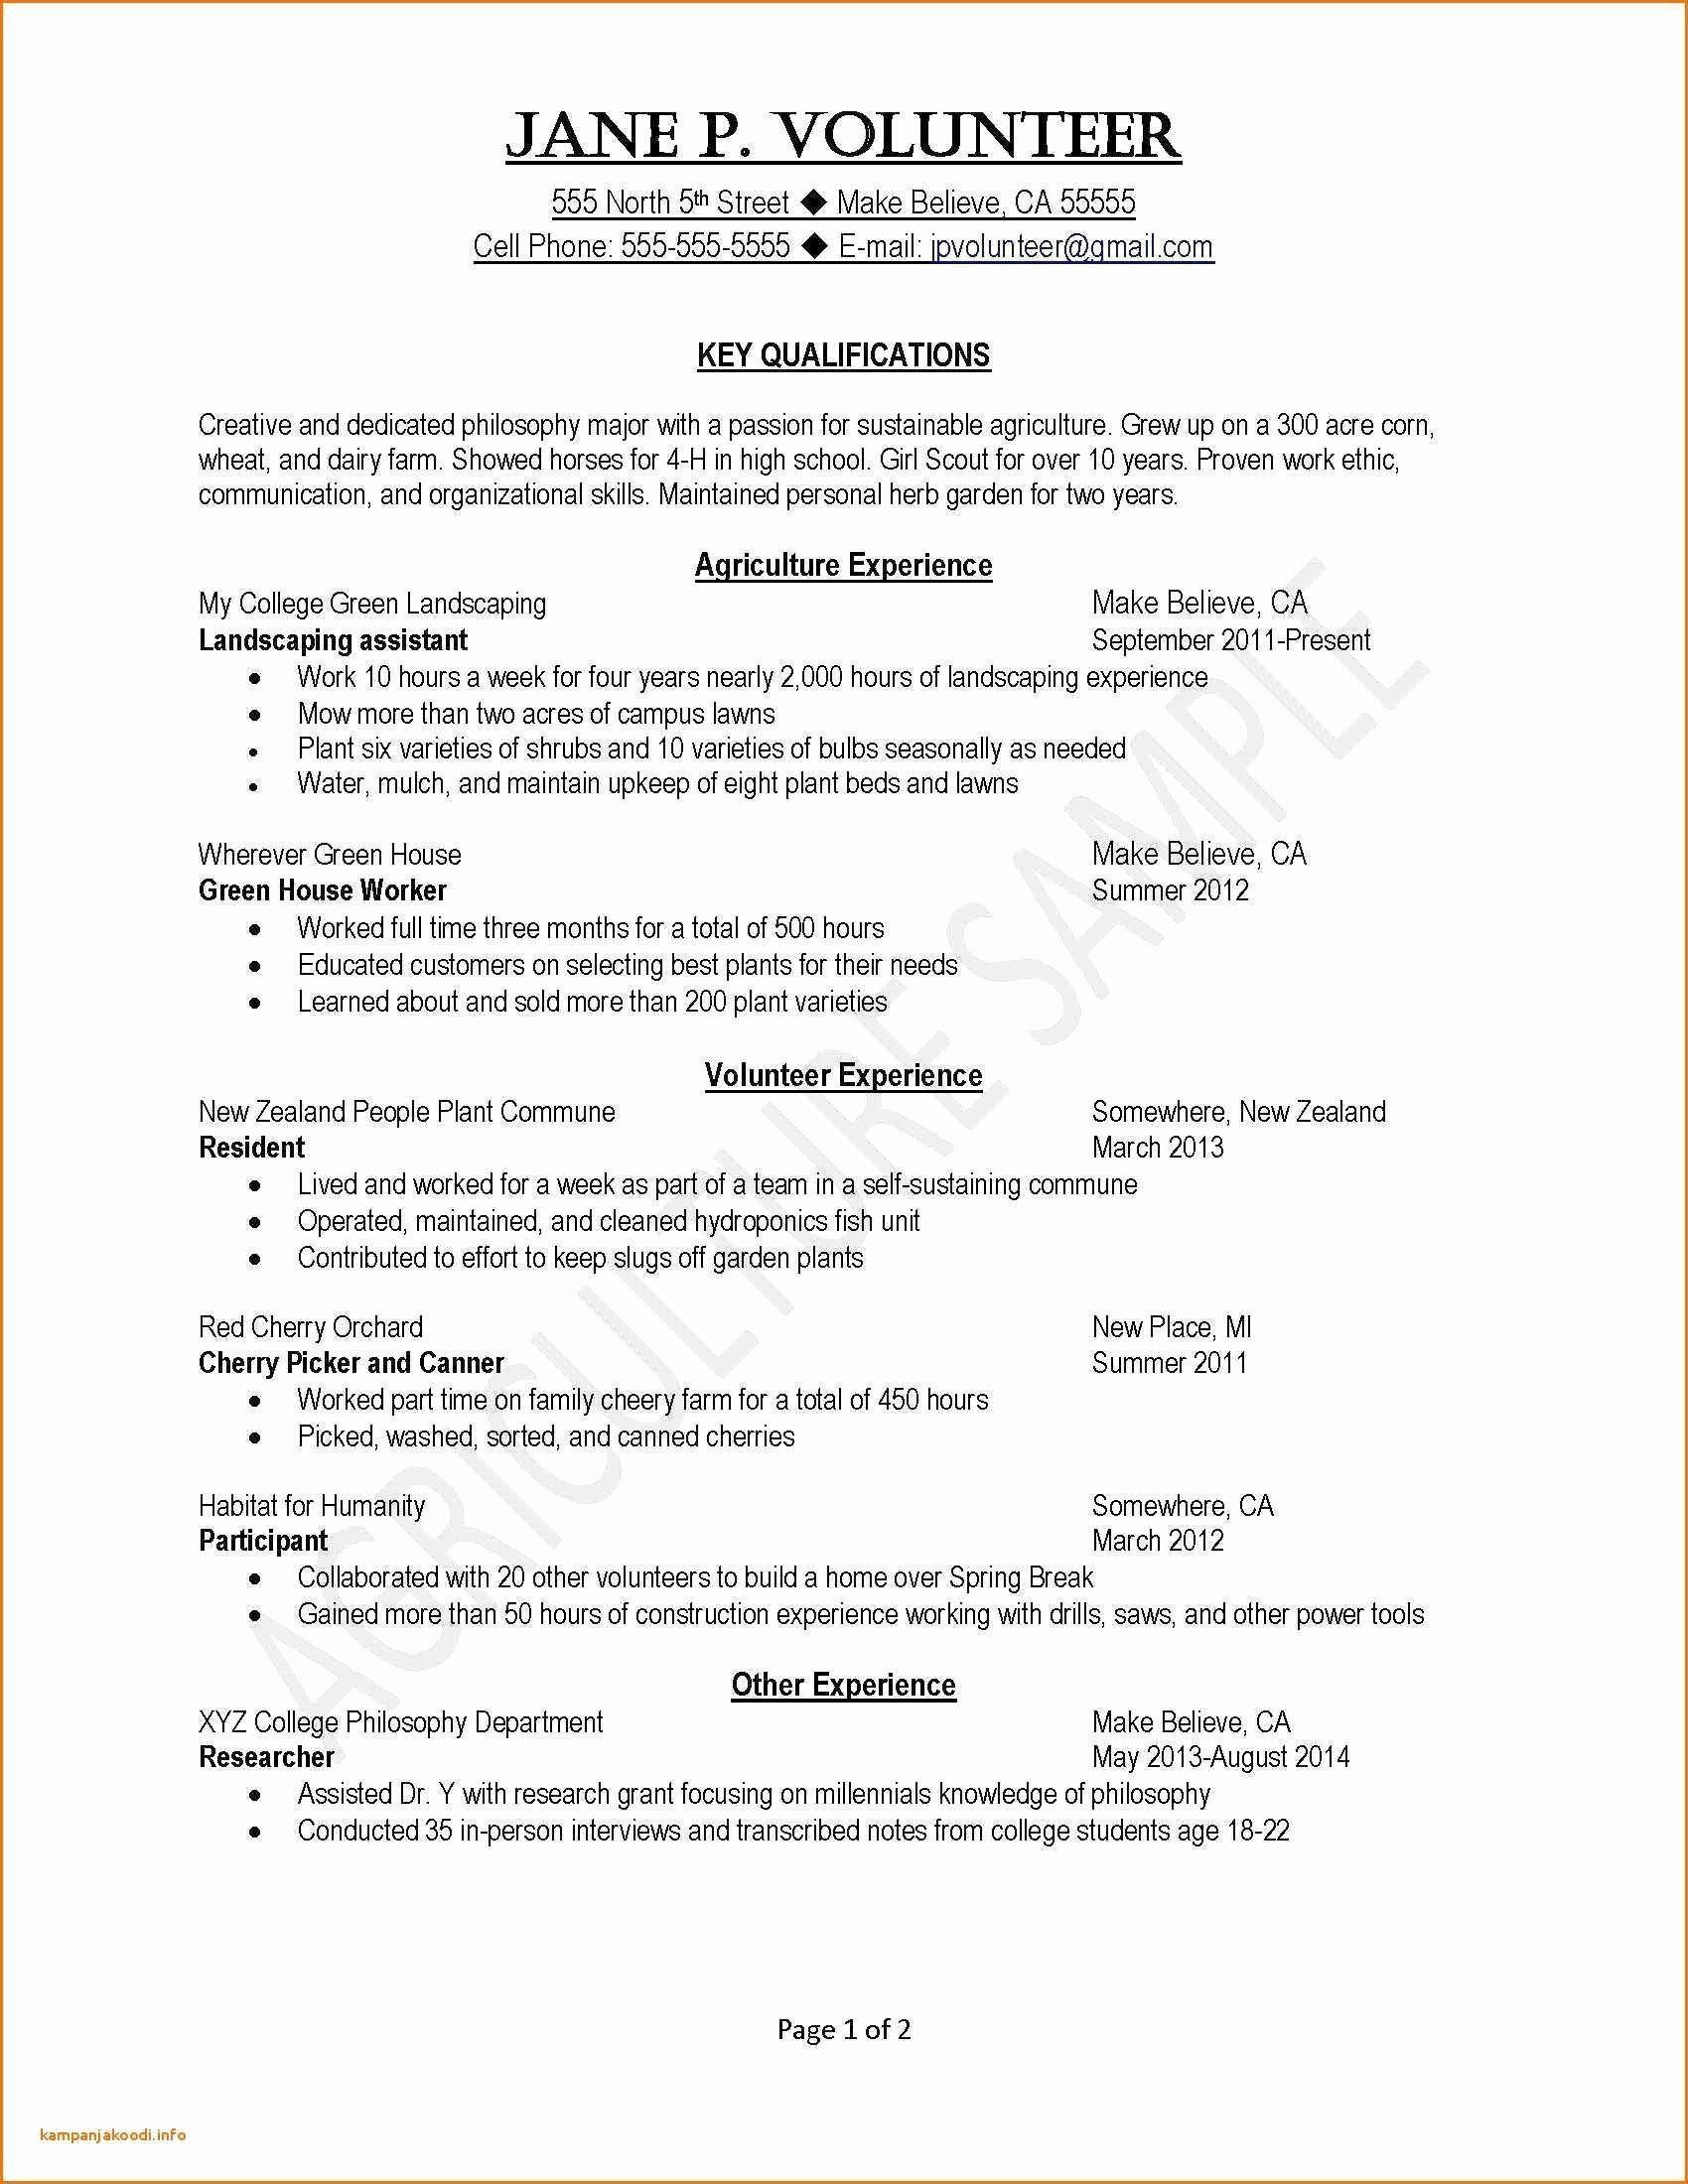 Junior Web Developer Resume Inspirational 47 How To Make A Standard Resume College Resume Template Cover Letter For Resume Resume Examples